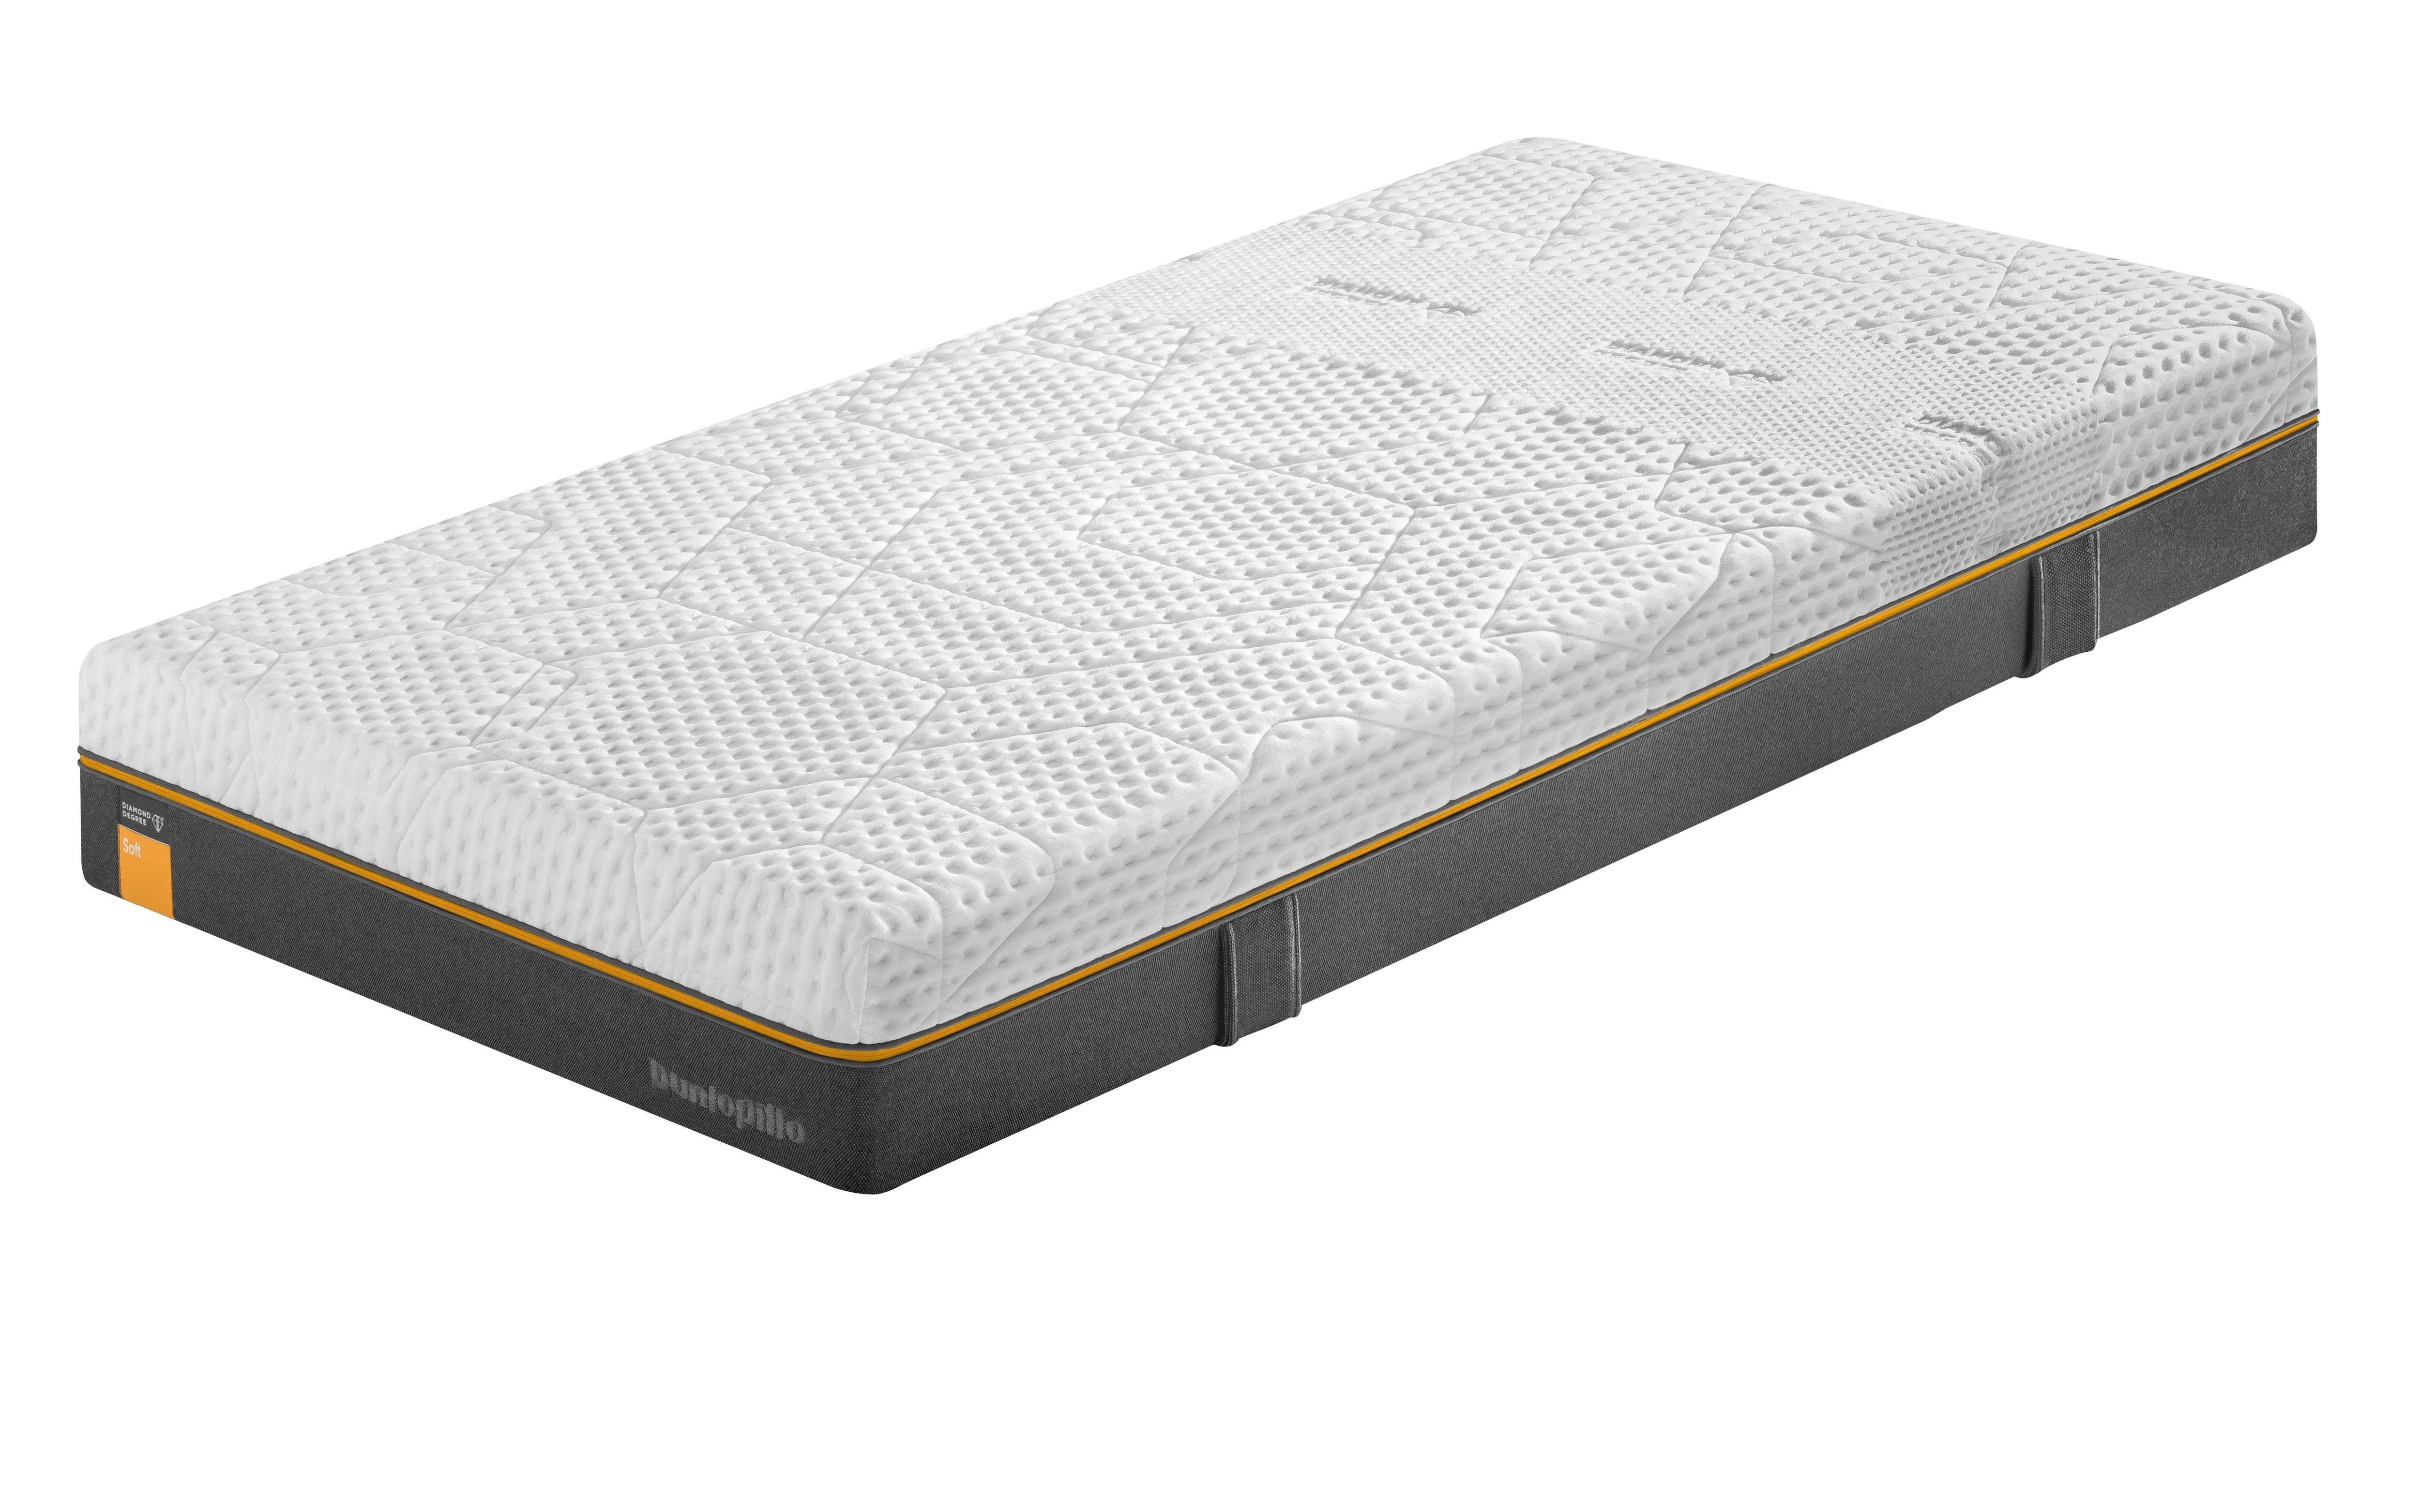 Kaltschaummatratze Diamond Degree Soft Dunlopillo 25 cm hoch